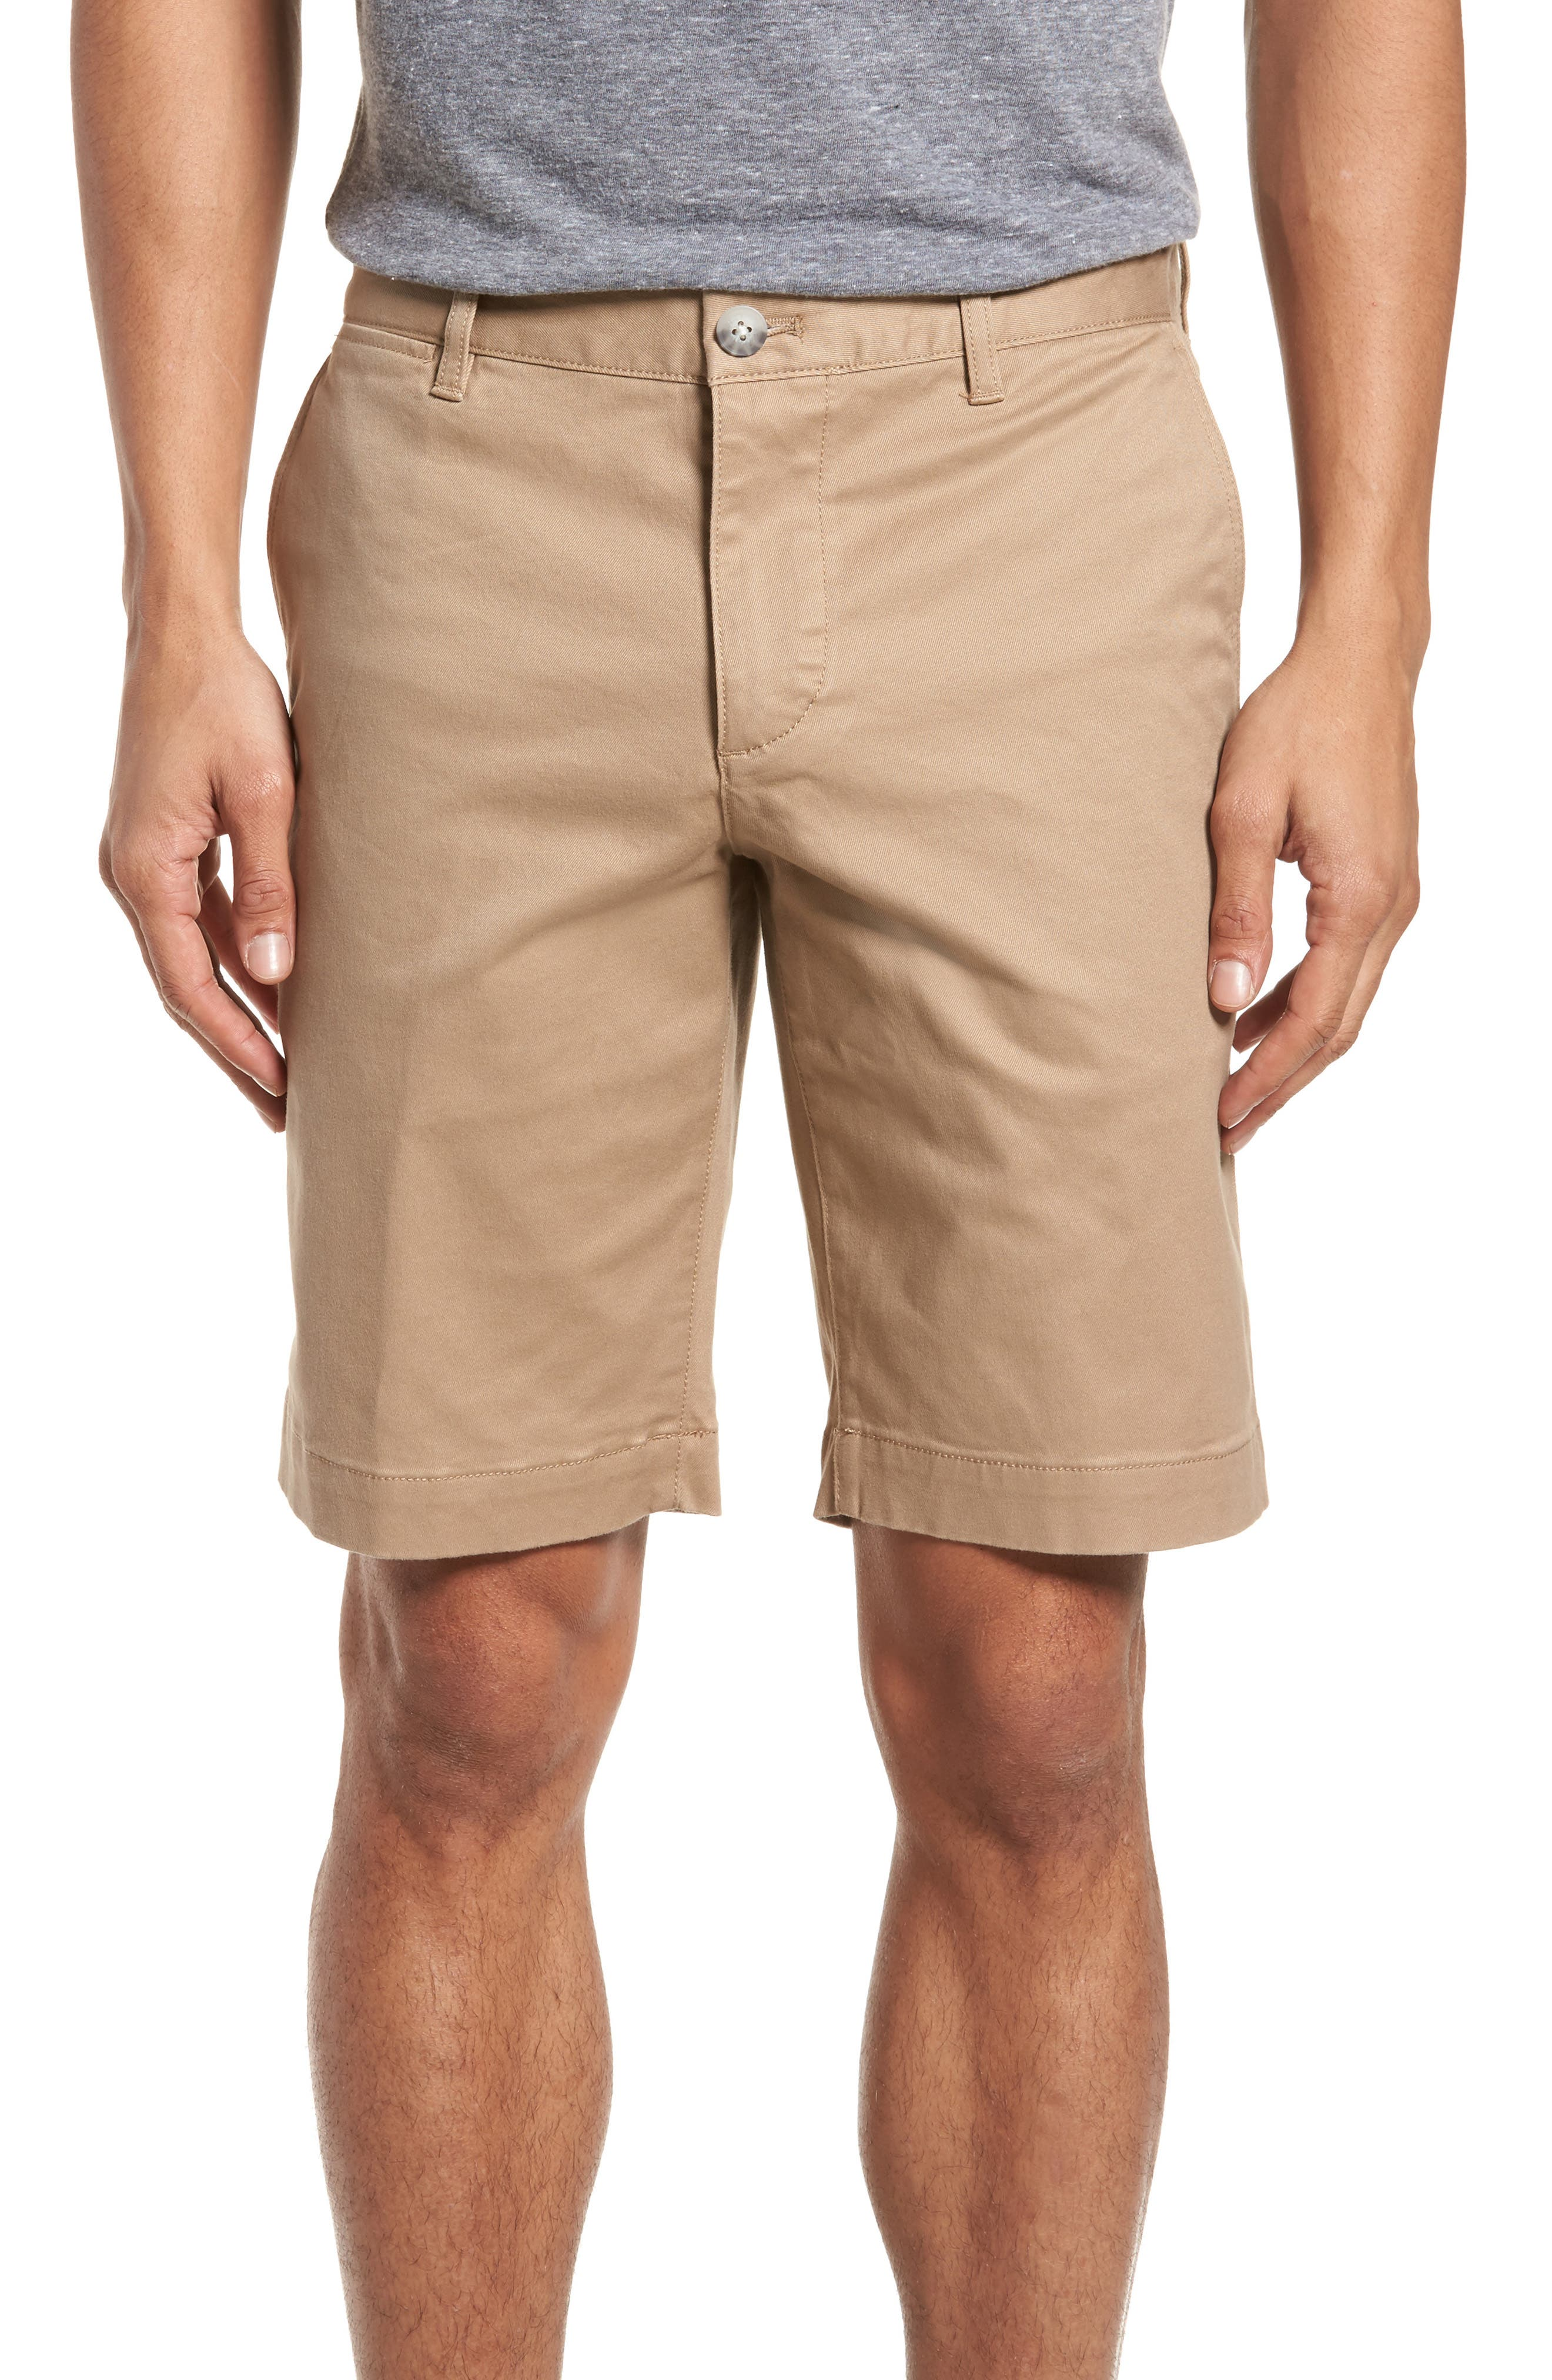 Slim Fit Chino Shorts,                         Main,                         color, Kraft Beige